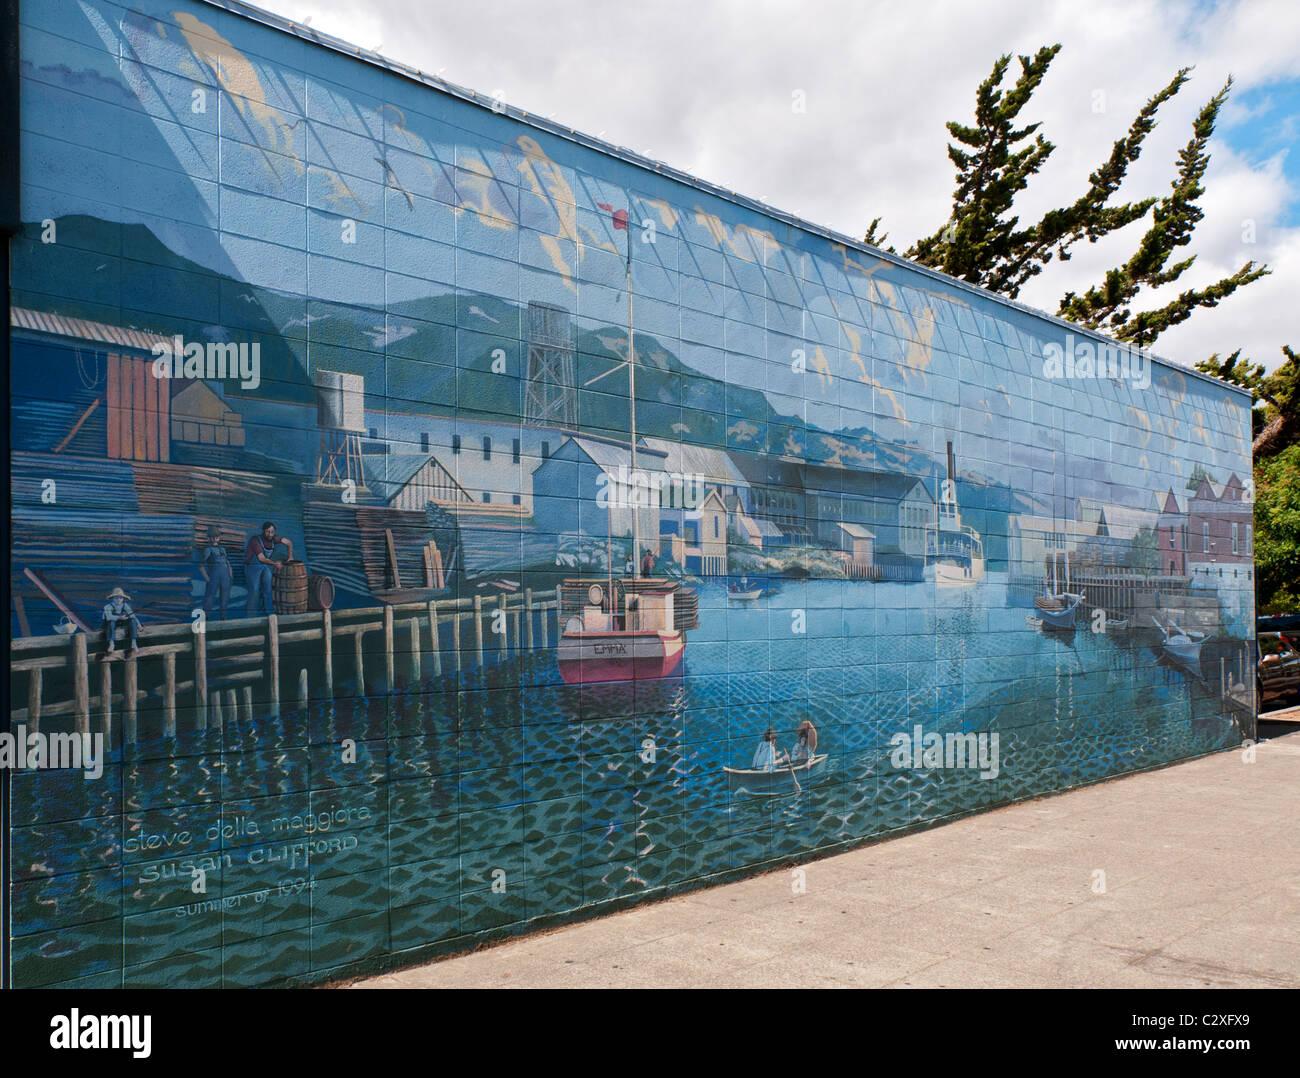 California napa downtown mural project mural 1 the for California mural